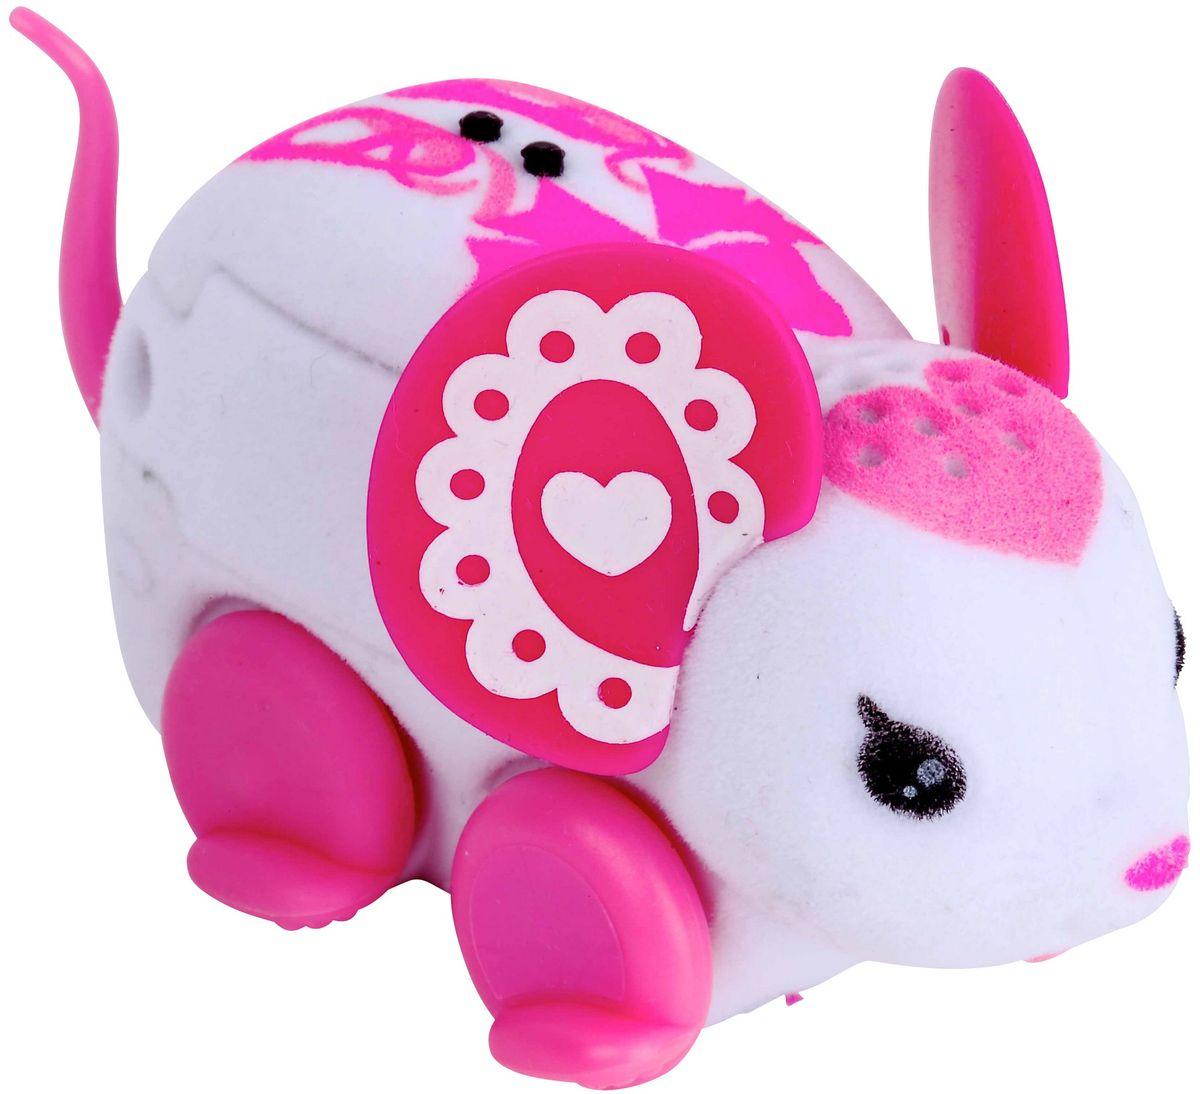 Moose Интерактивная игрушка Мышка Bella Tina - Интерактивные игрушки